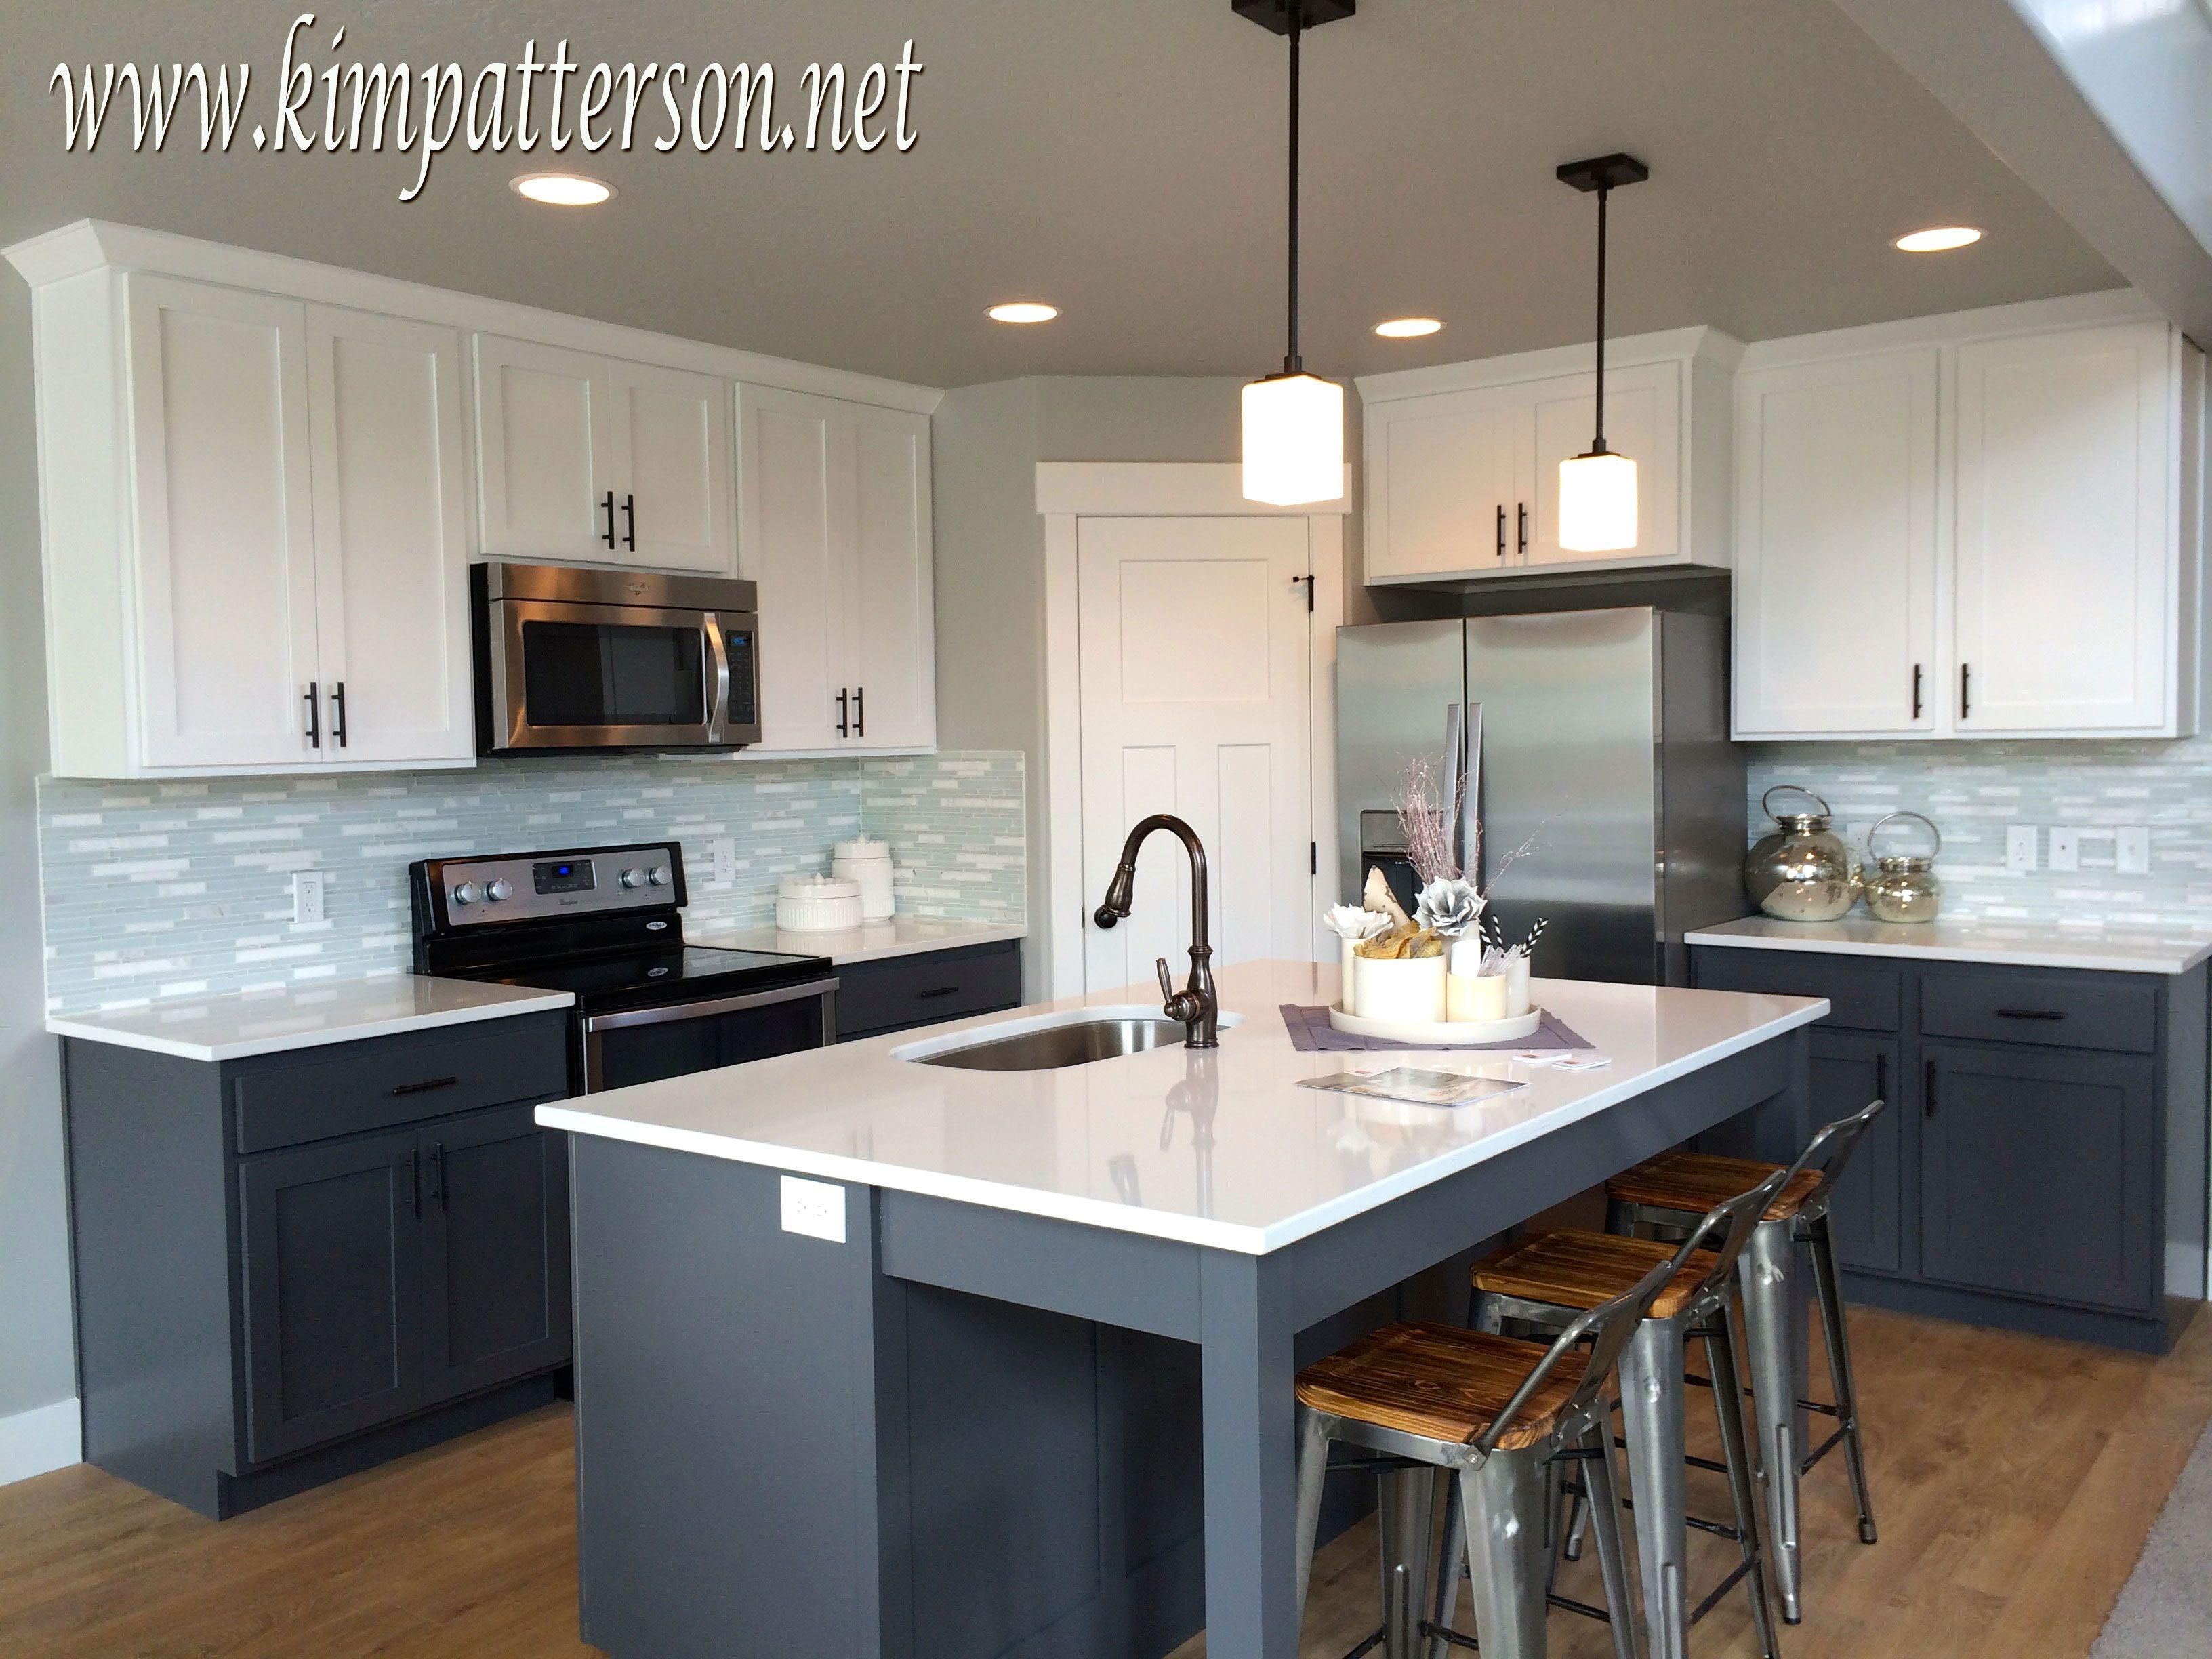 Best Kitchen Antique White Cabinets With Black Appliances Grey 400 x 300